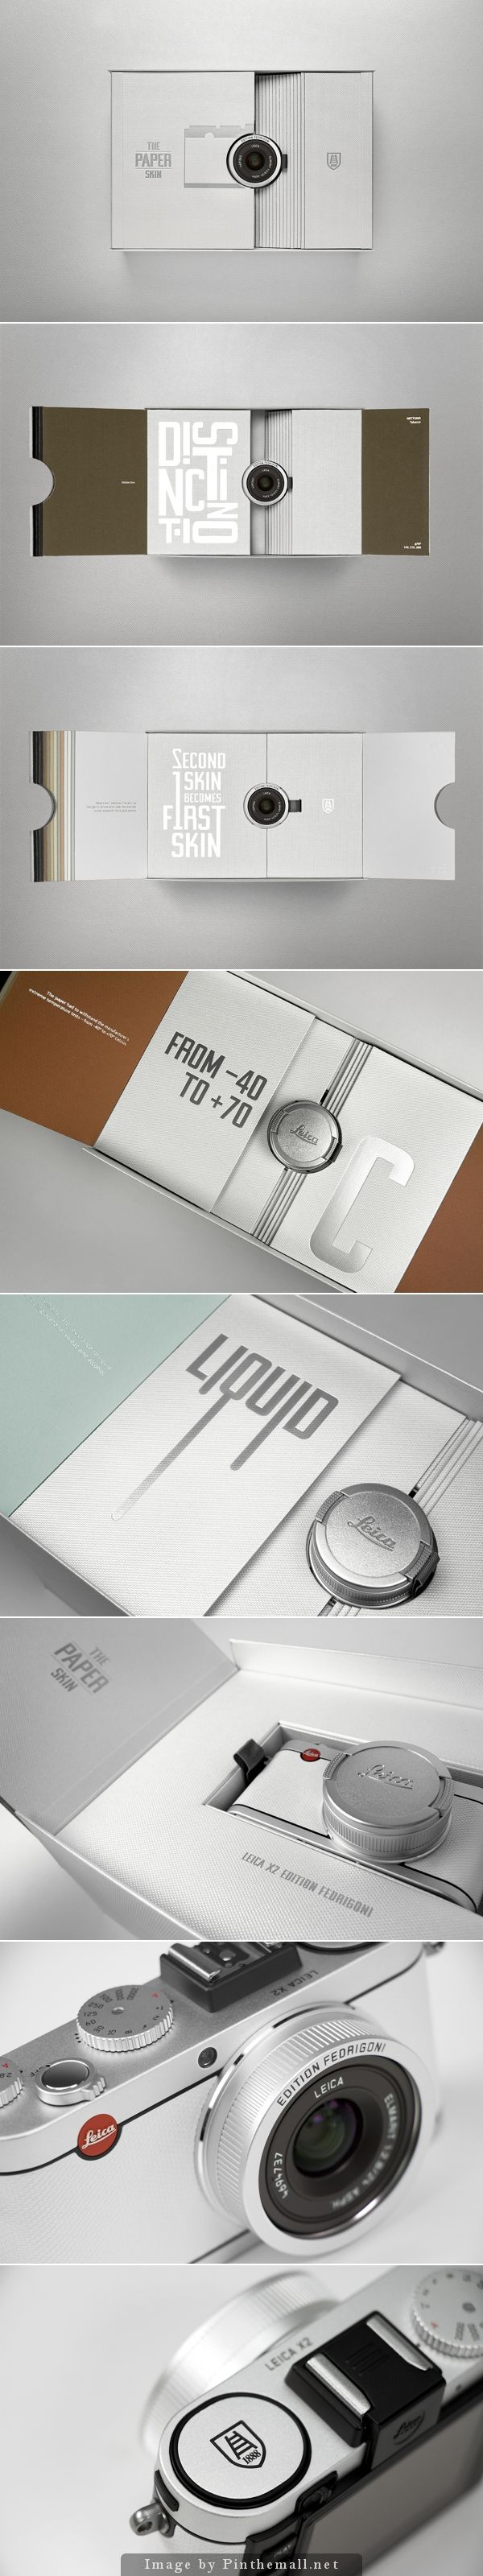 The Paper Skin – Leica X2 Edition Fedrigoni / Felix Dürichen